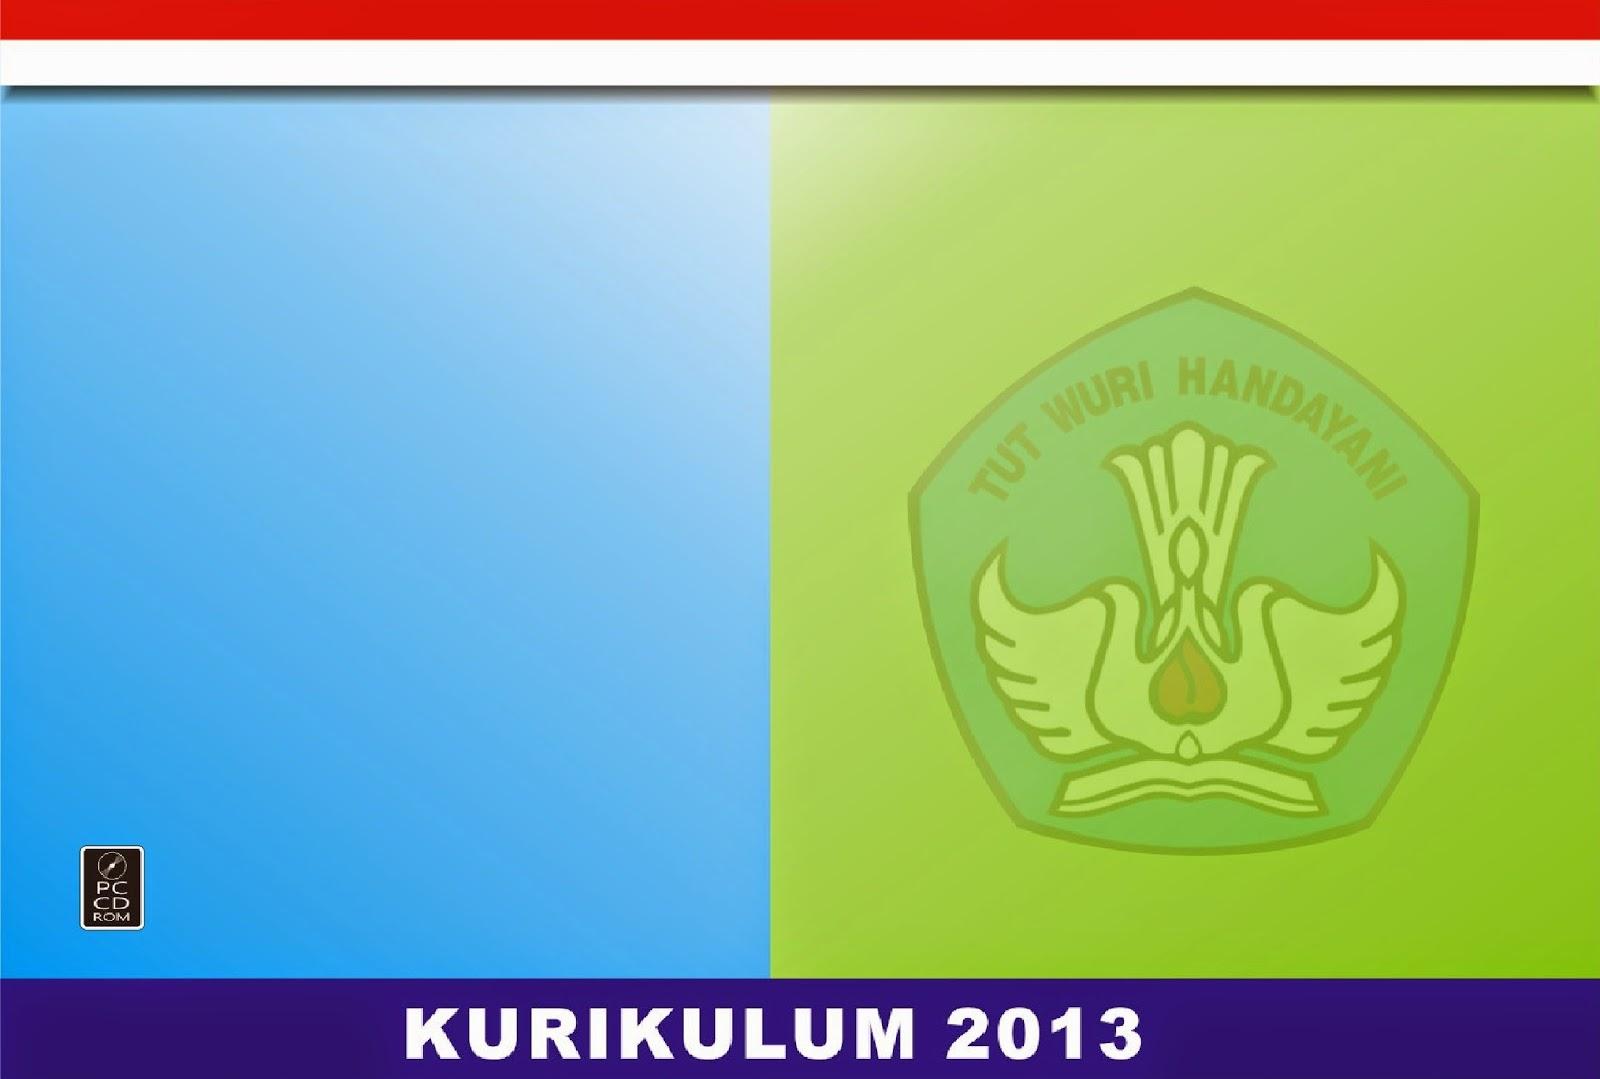 RPP SD KURIKULUM 2013 SEMESTER I & II